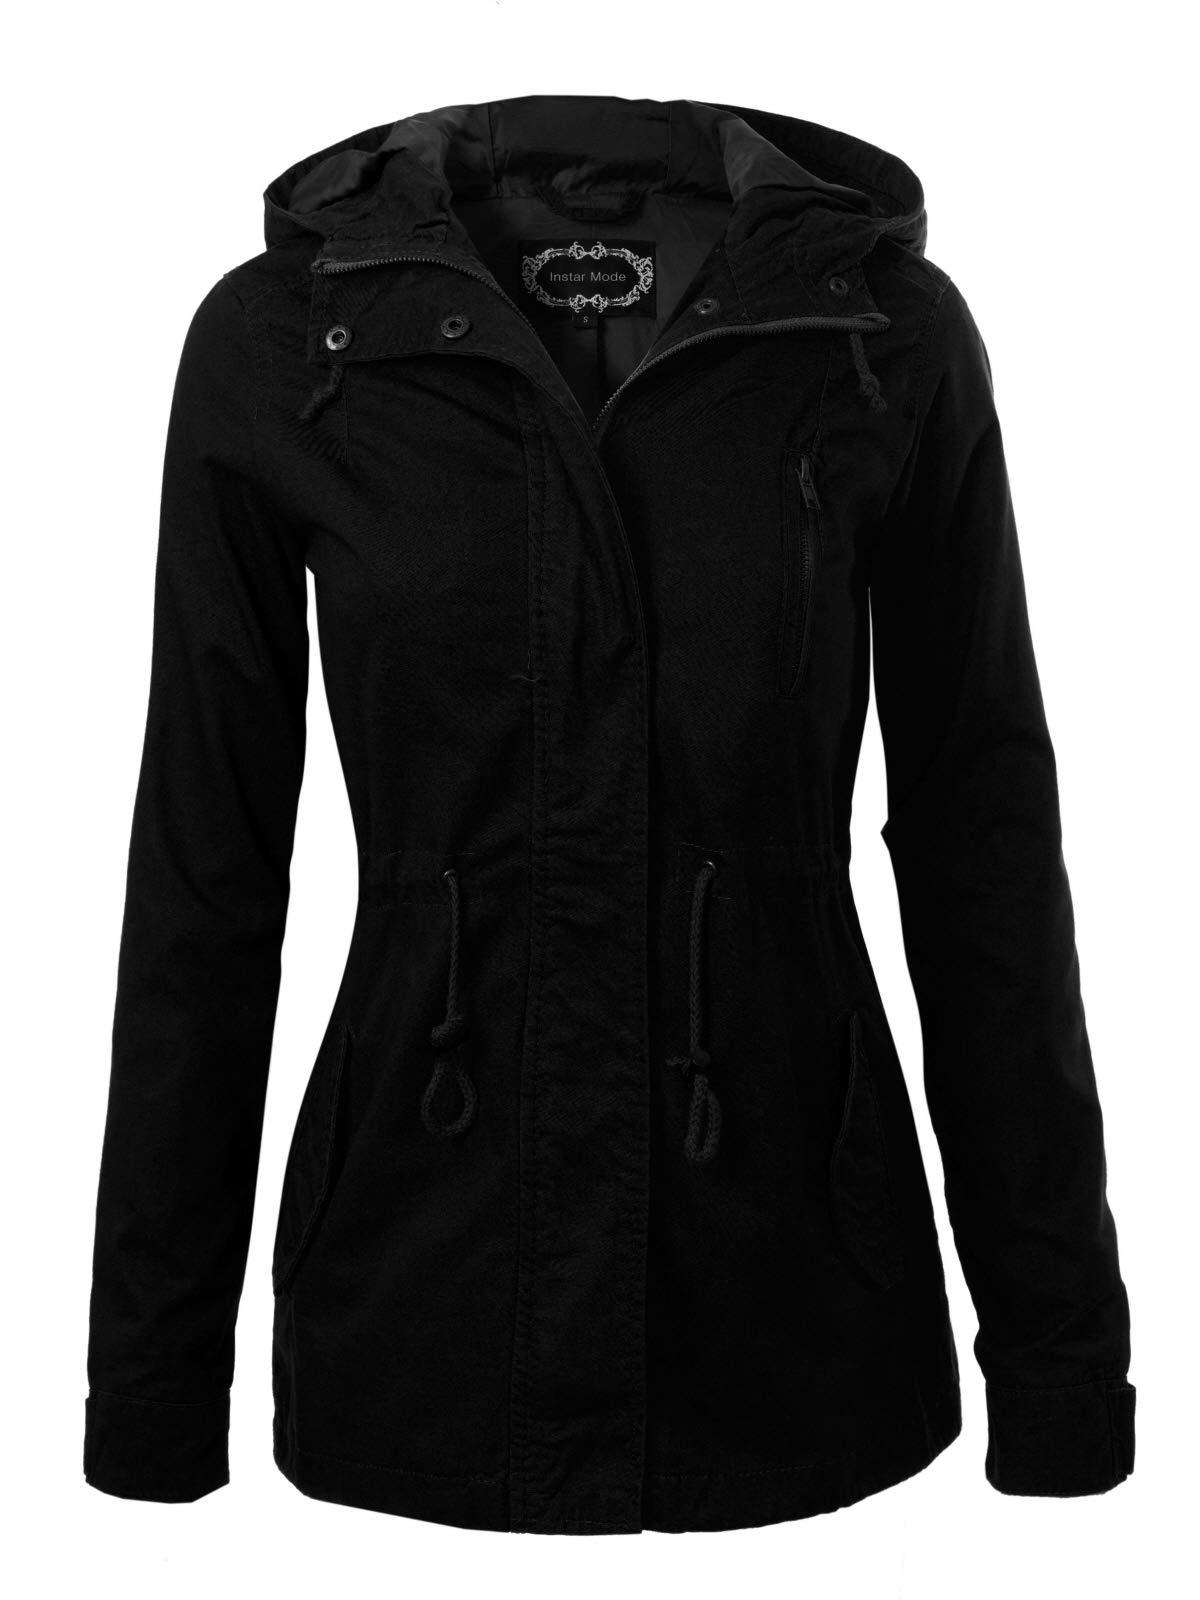 Instar Mode Women's Military Anorak Safari Hoodie Jacket Black 2XL by Design by Olivia